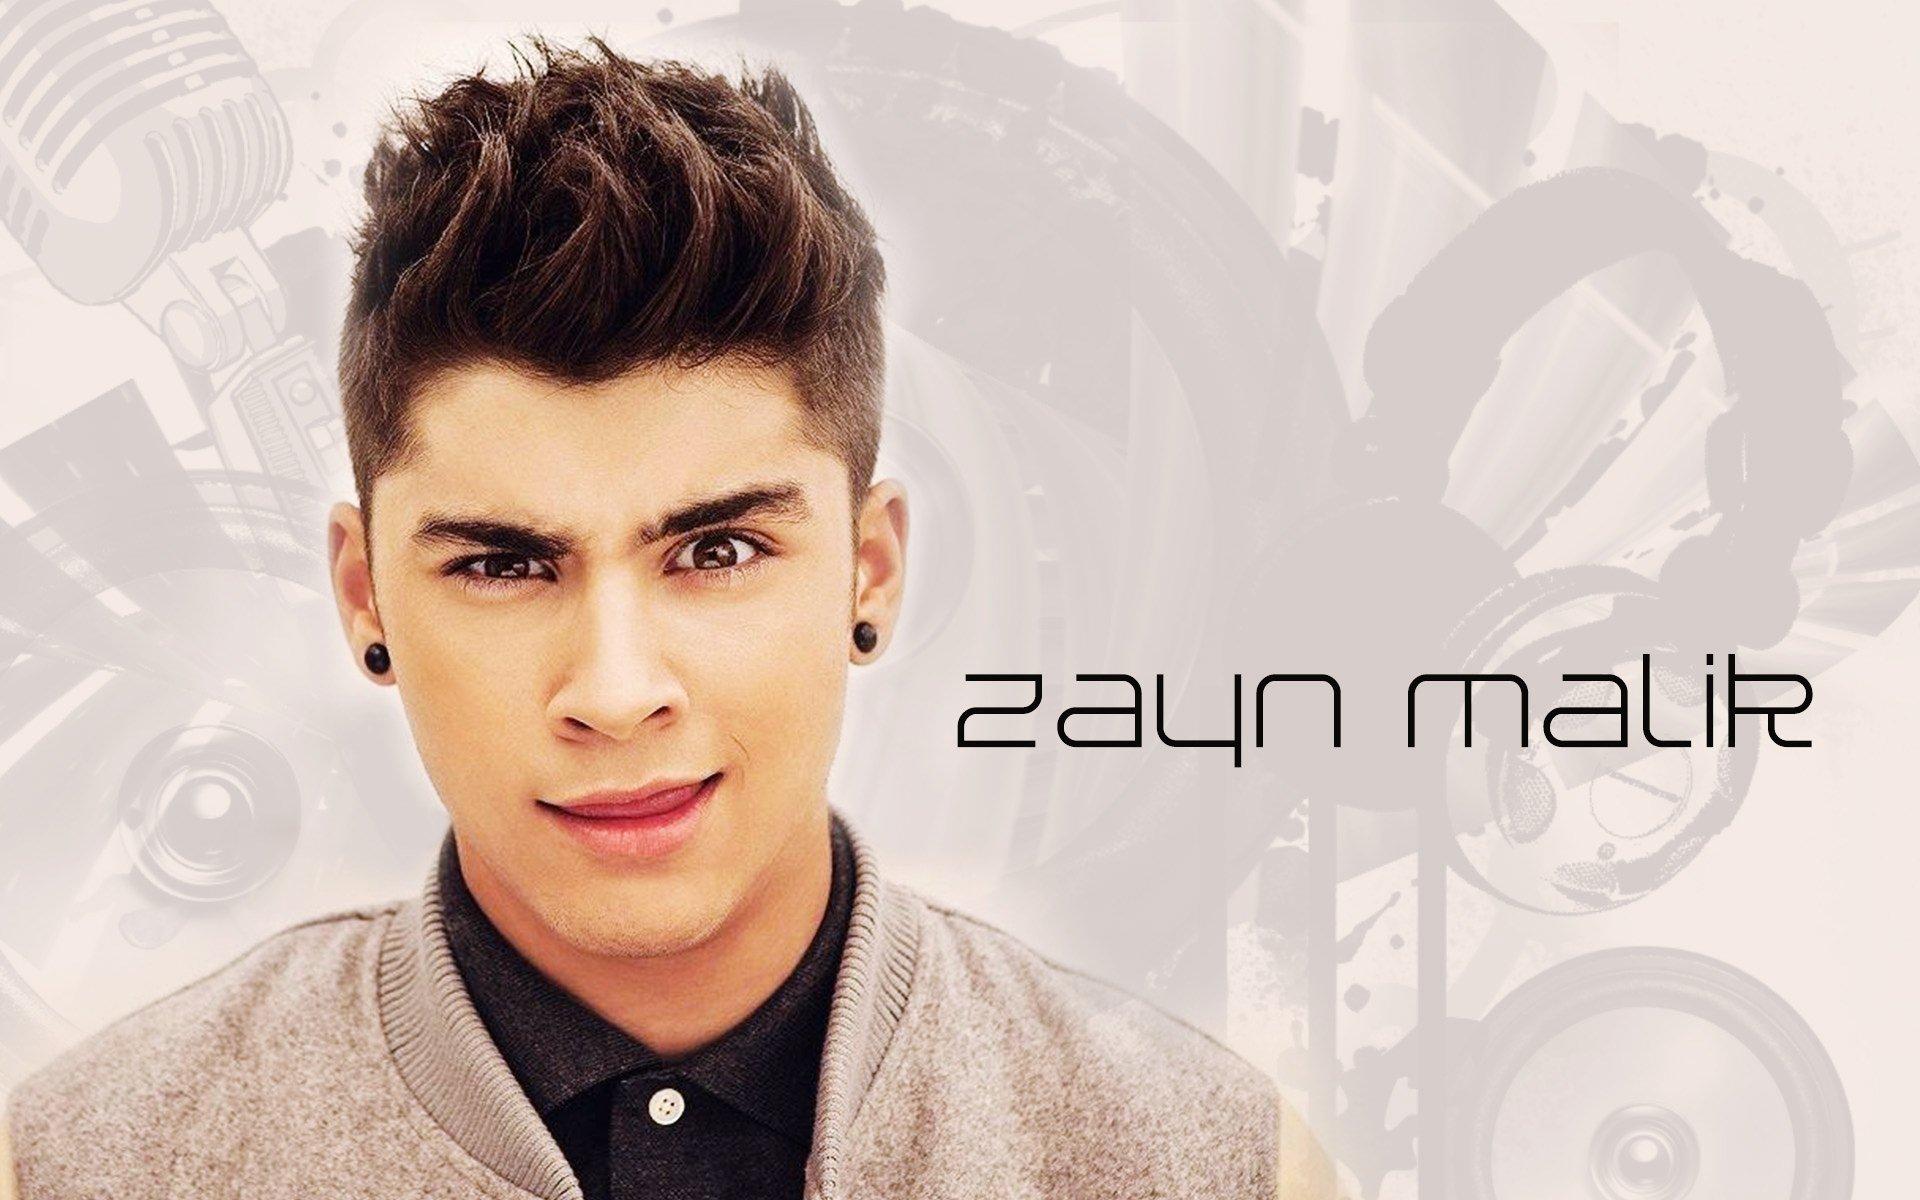 Zayn Malik Wallpapers Pictures Images - Hairstyle zayn malik terbaru